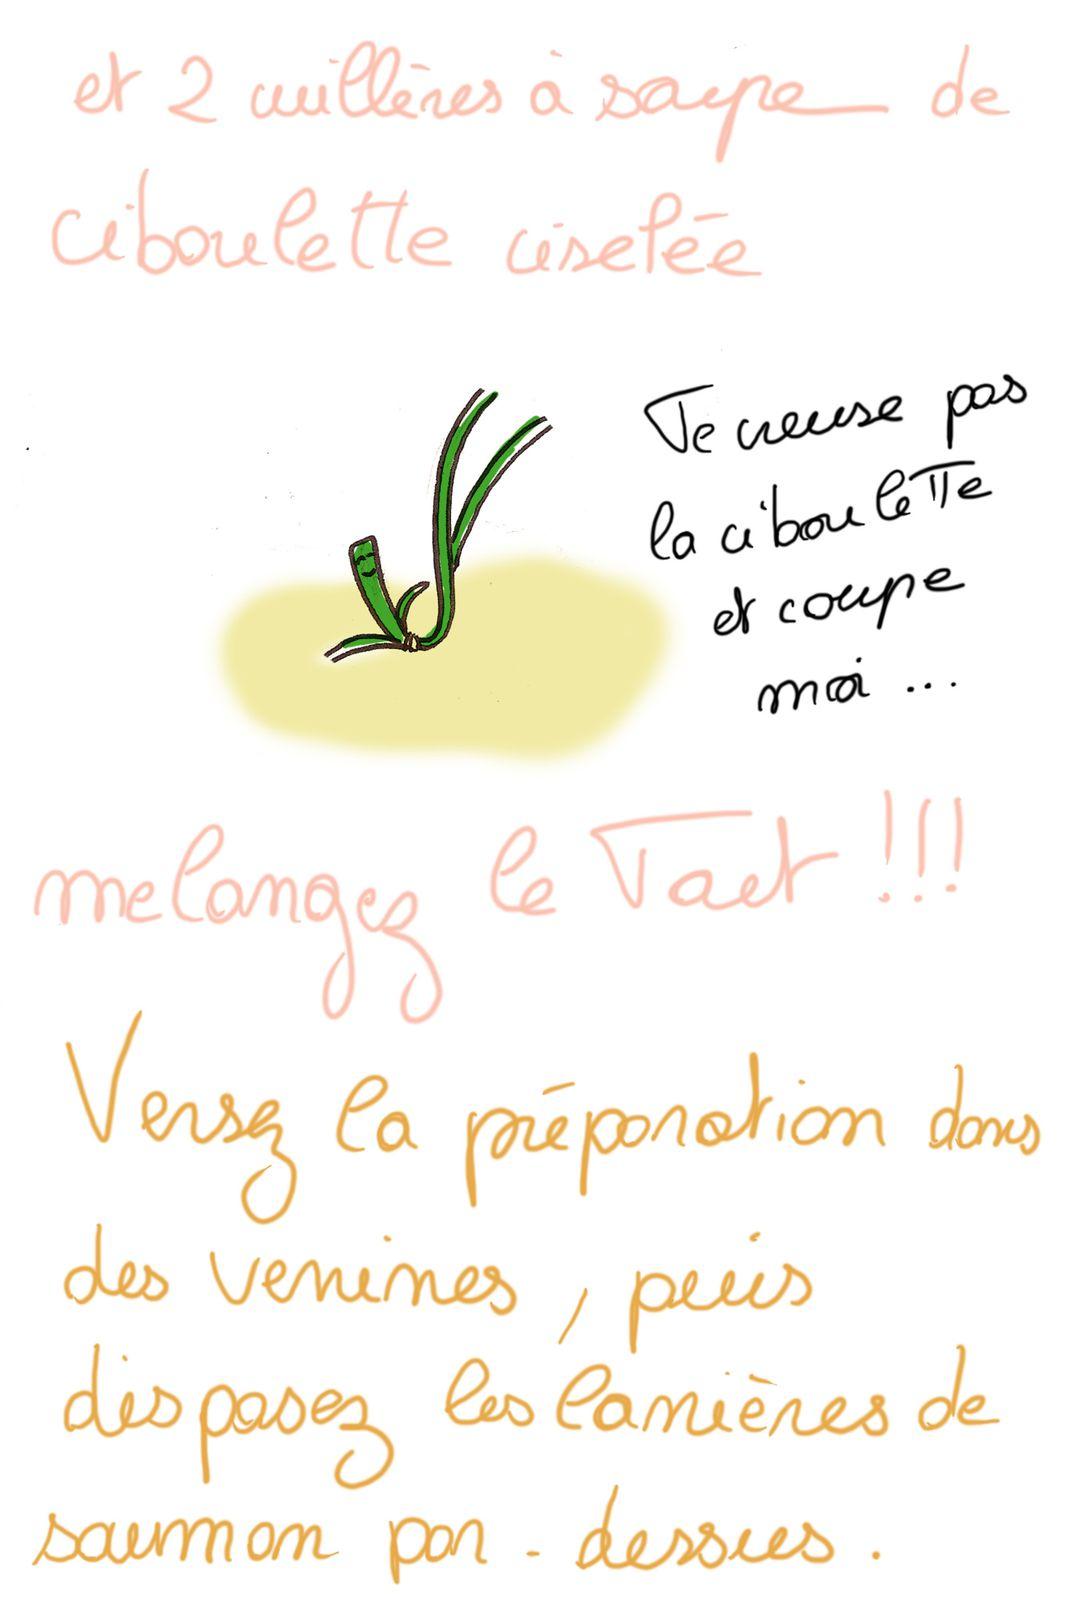 saumon-gribouille-3.jpg